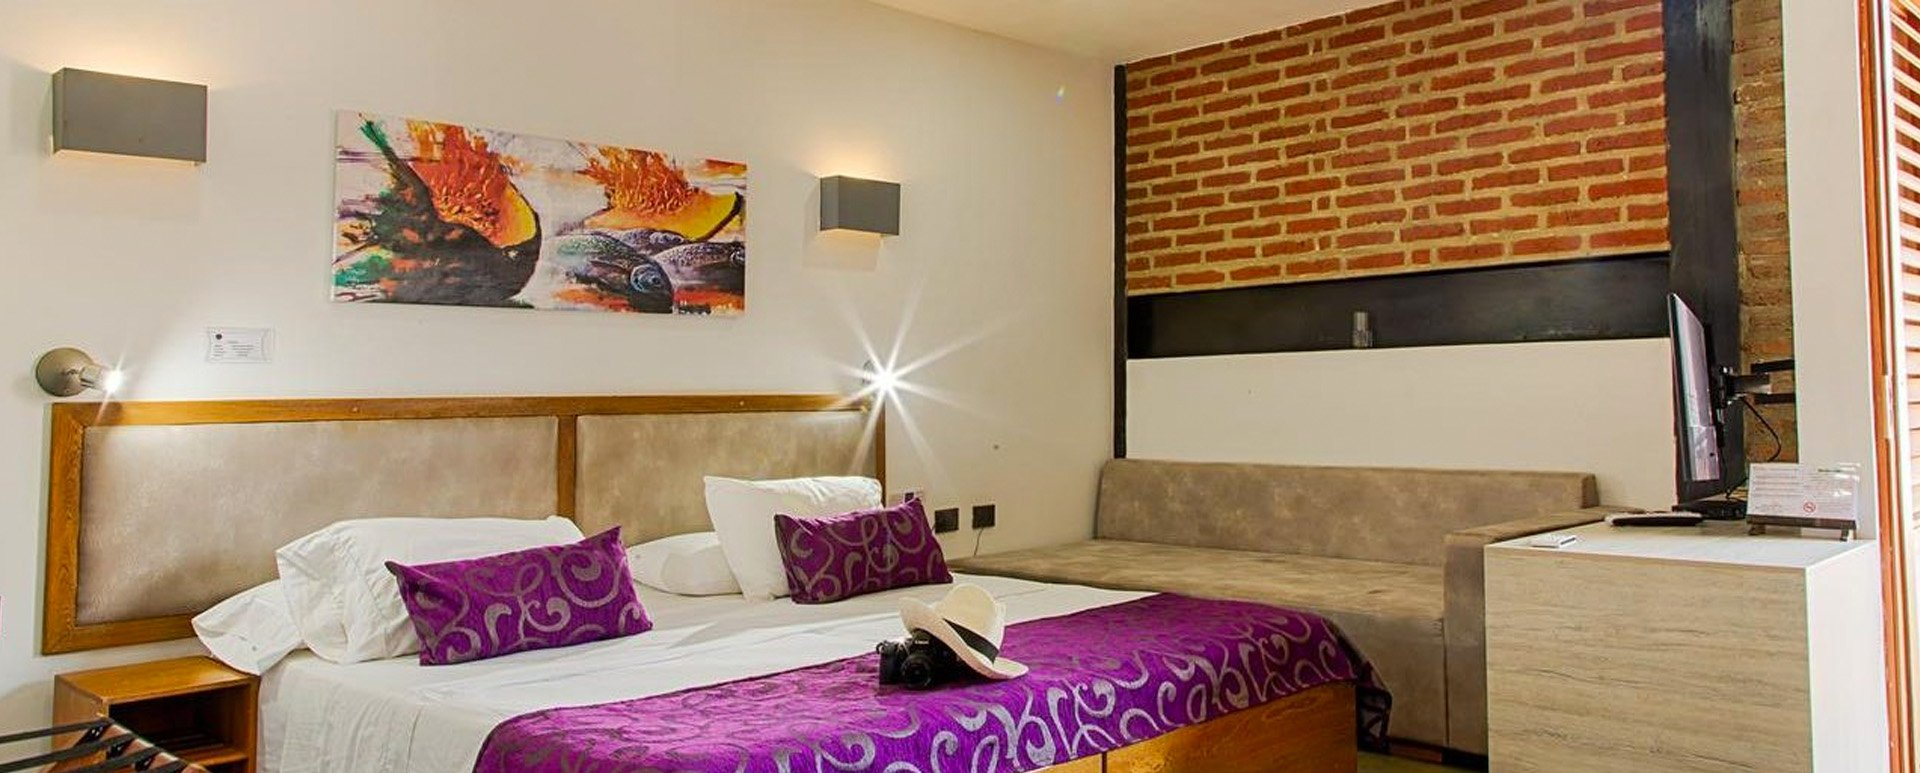 Casa carolina Hotel room